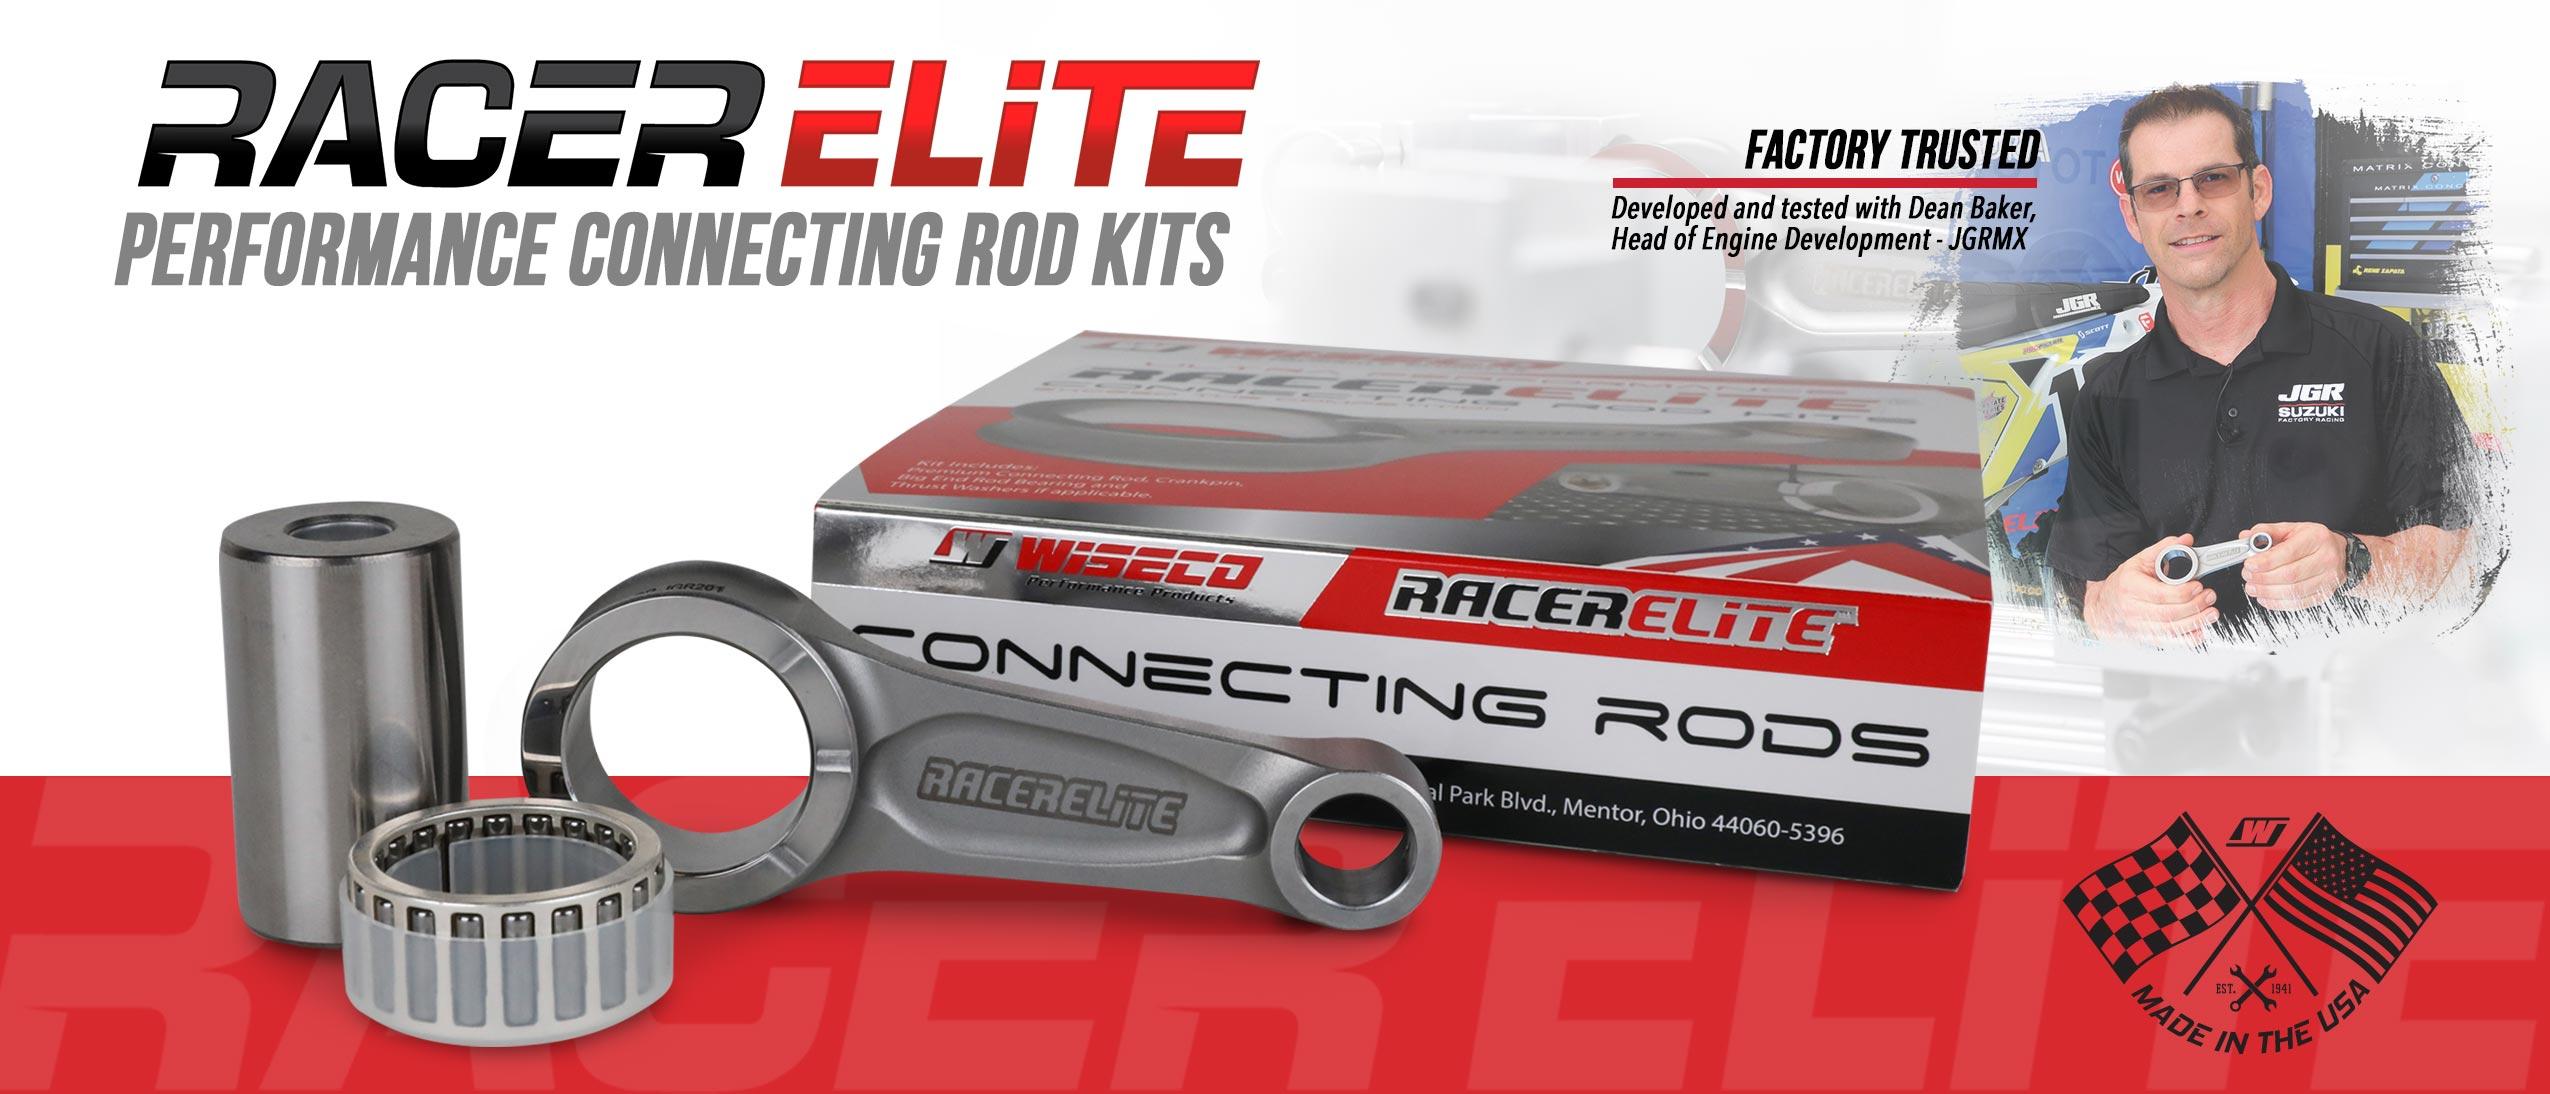 210817 Wiseco_Racer_Elite_Rods_2